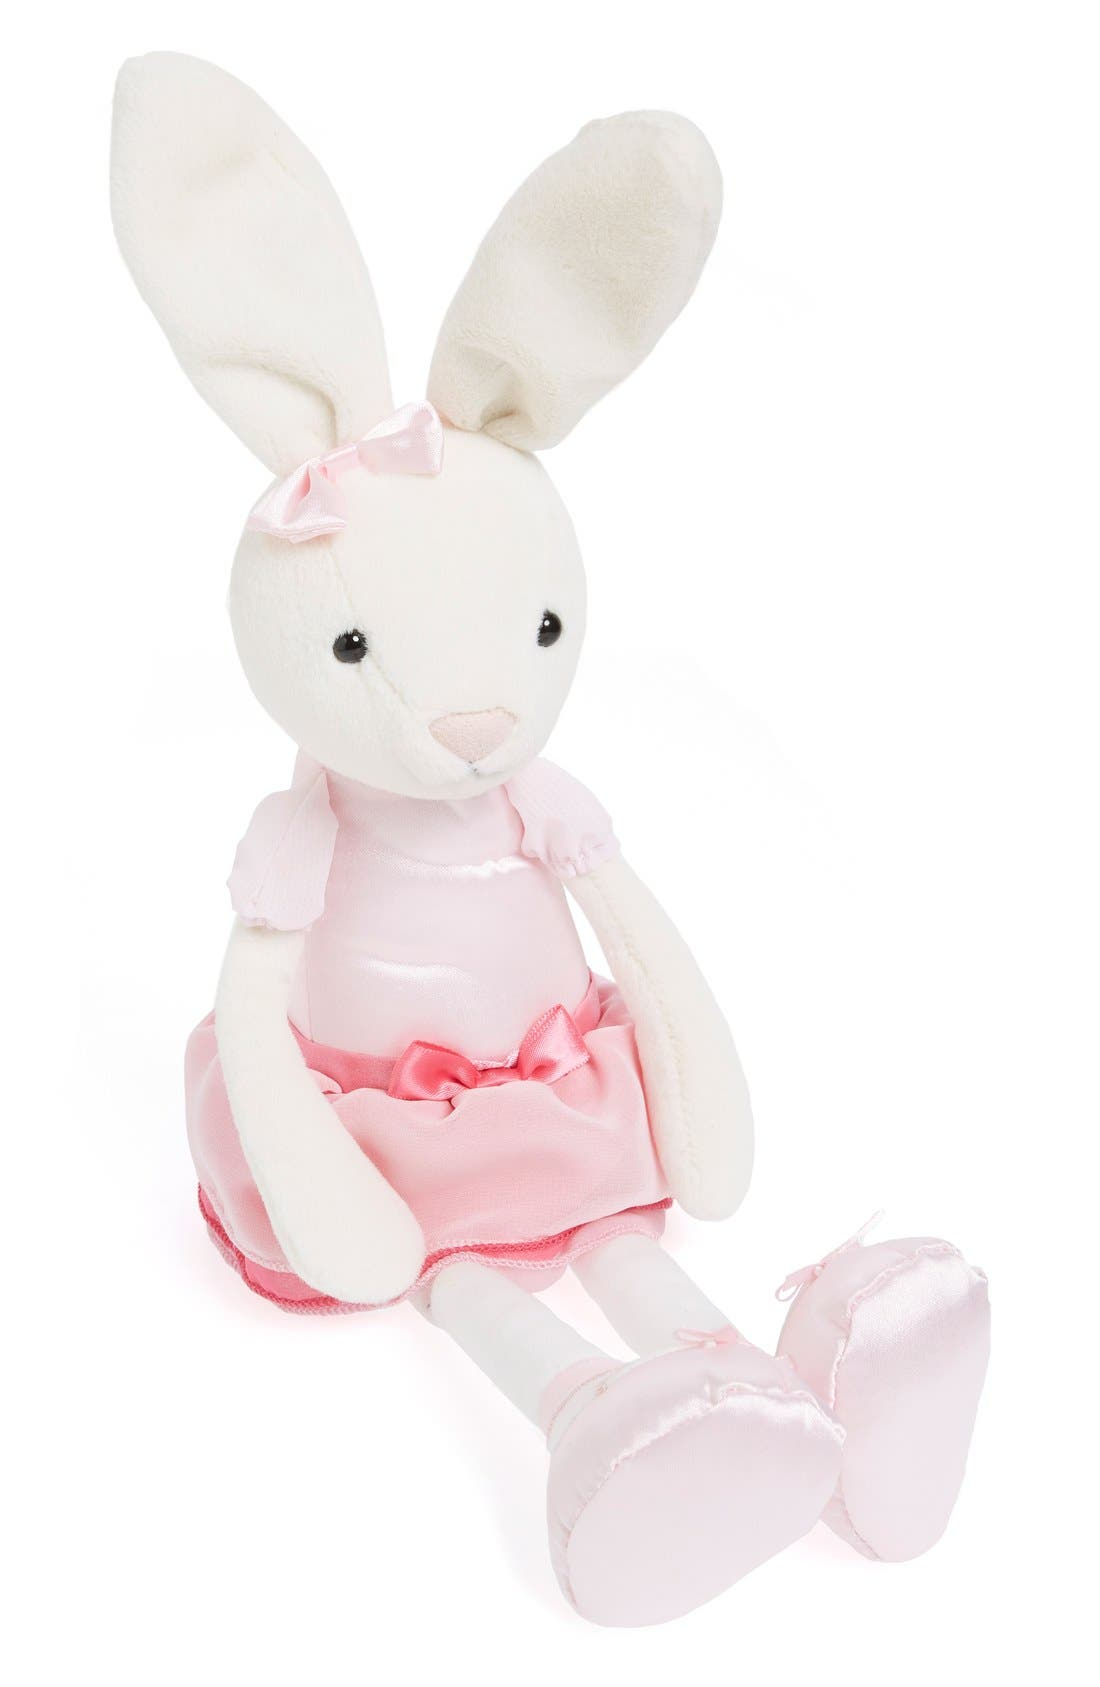 'Bitsy Ballerina Bunny' Stuffed Animal,                         Main,                         color, Pink/ Cream